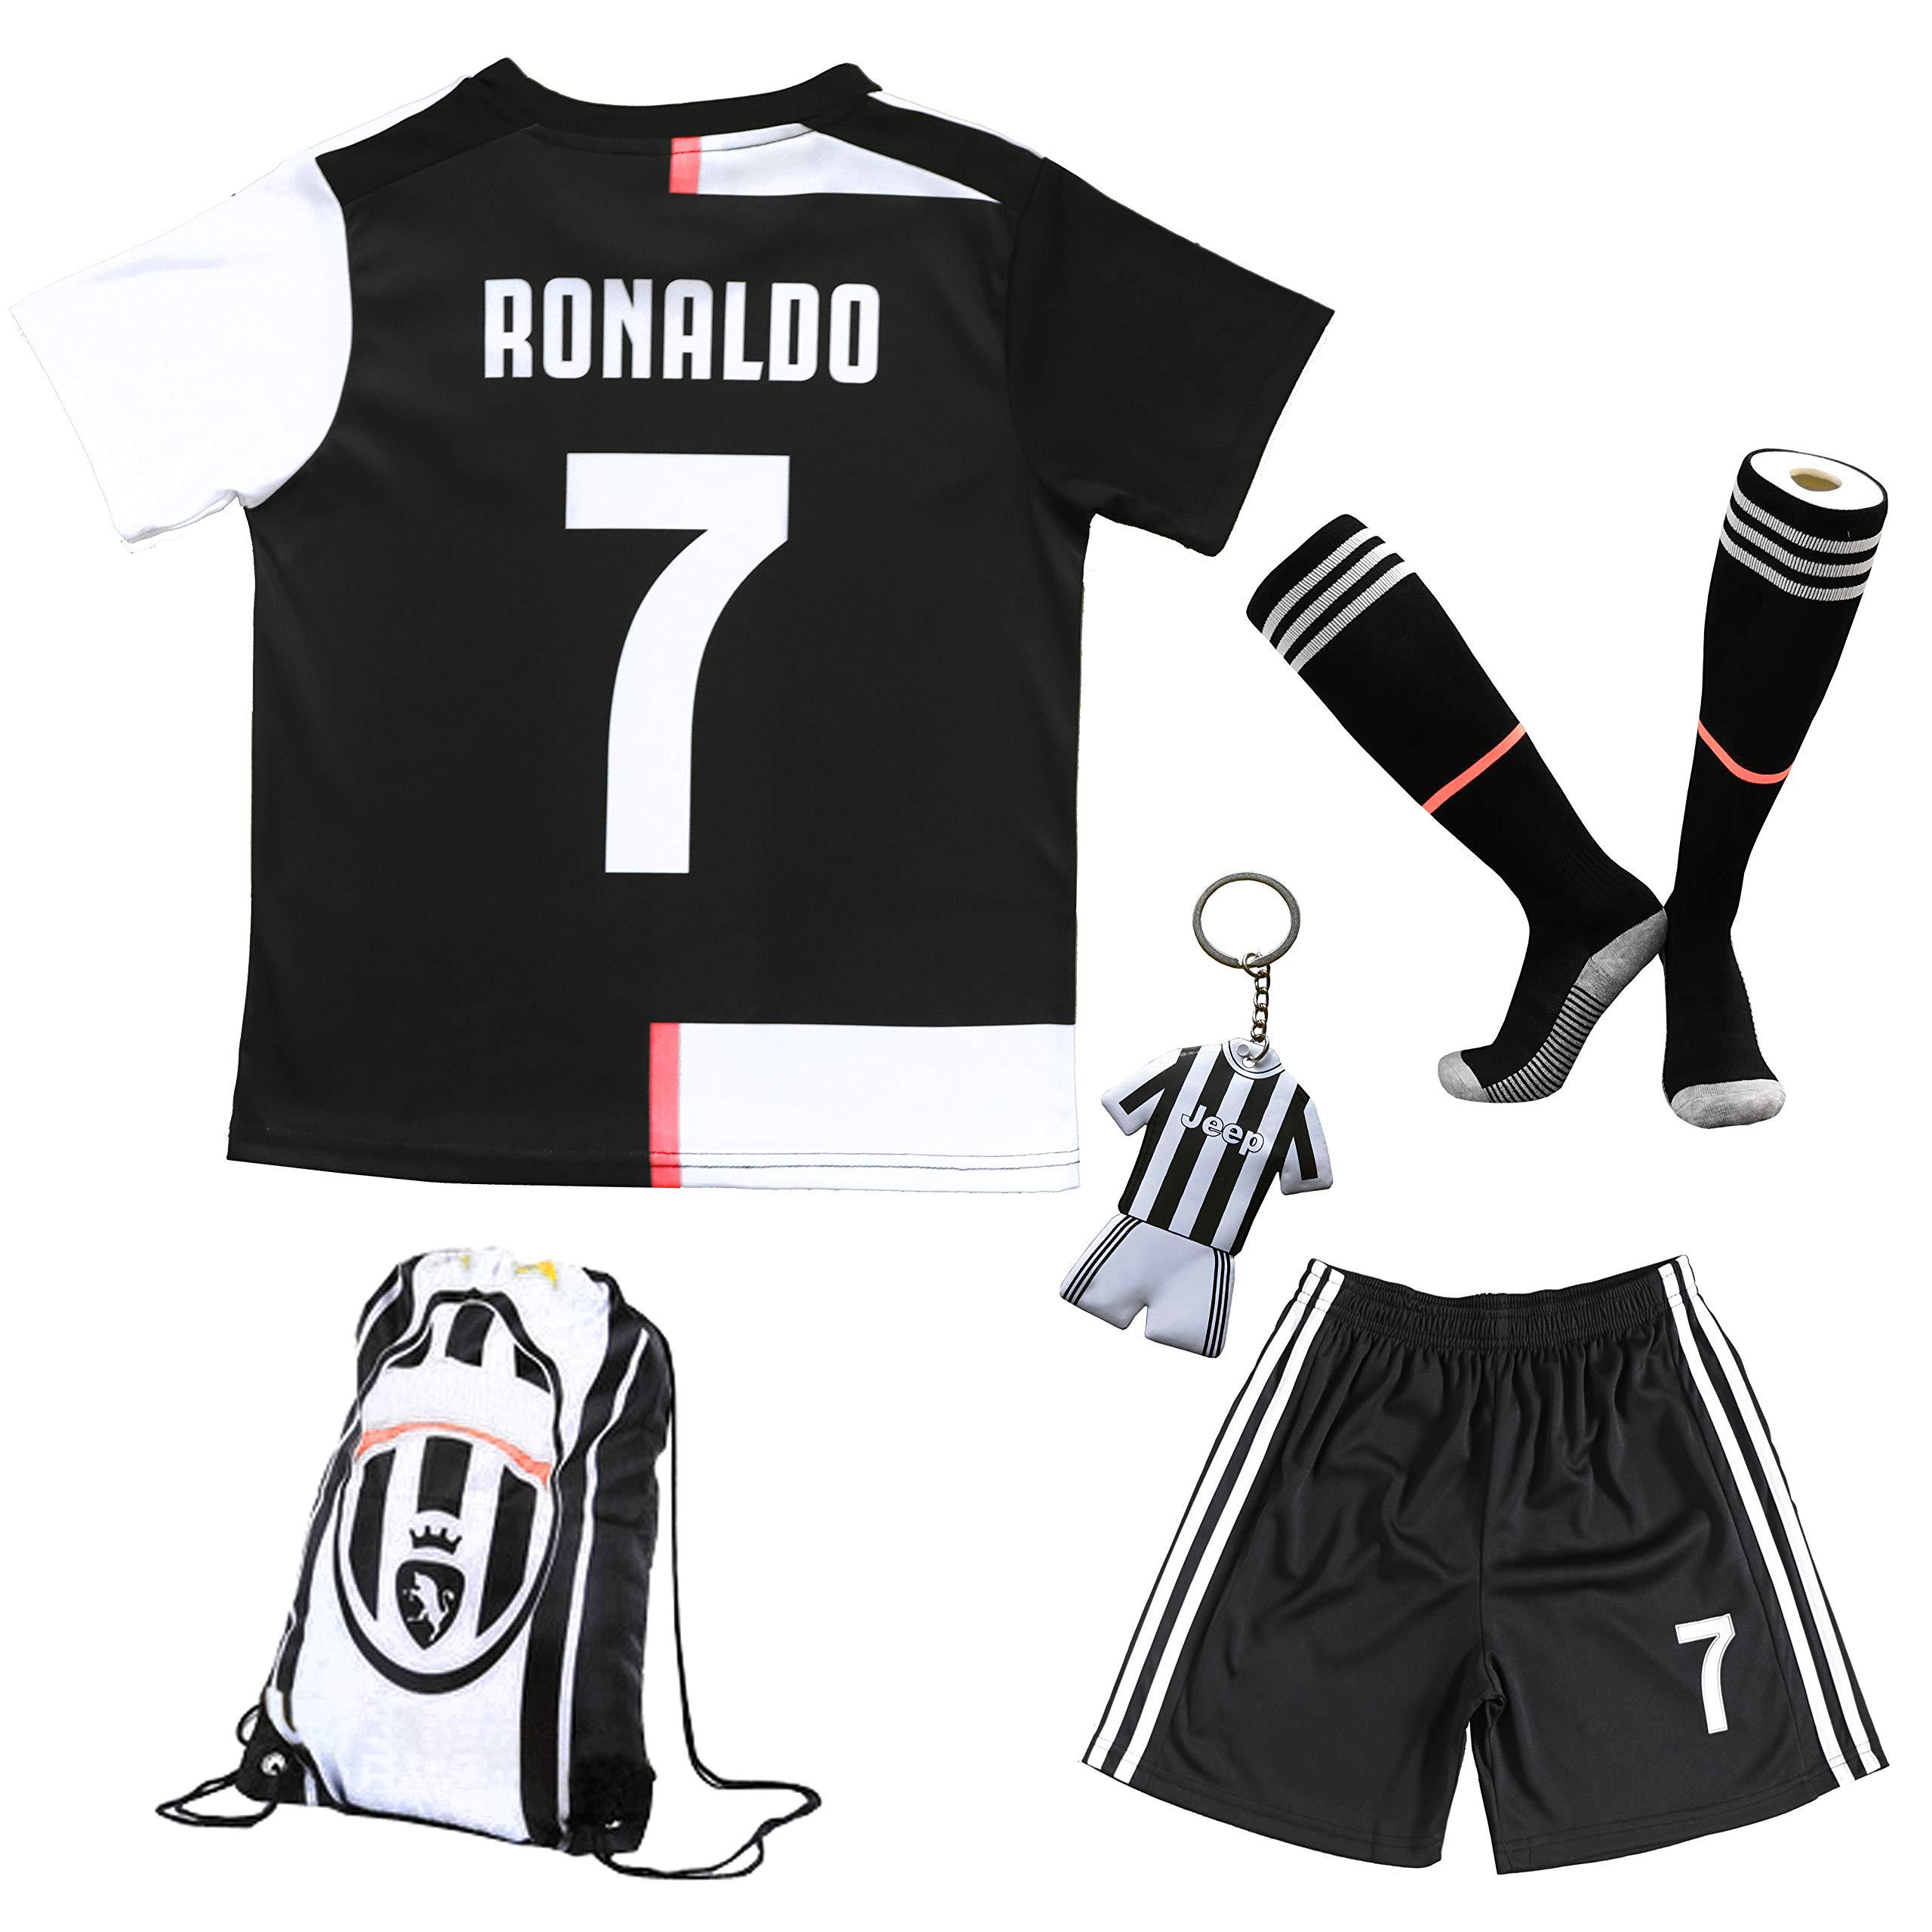 BIRDBOX 青年运动装 C.Ronaldo 7 儿童家居足球运动衫/短裤包钥匙扣足球袜套装